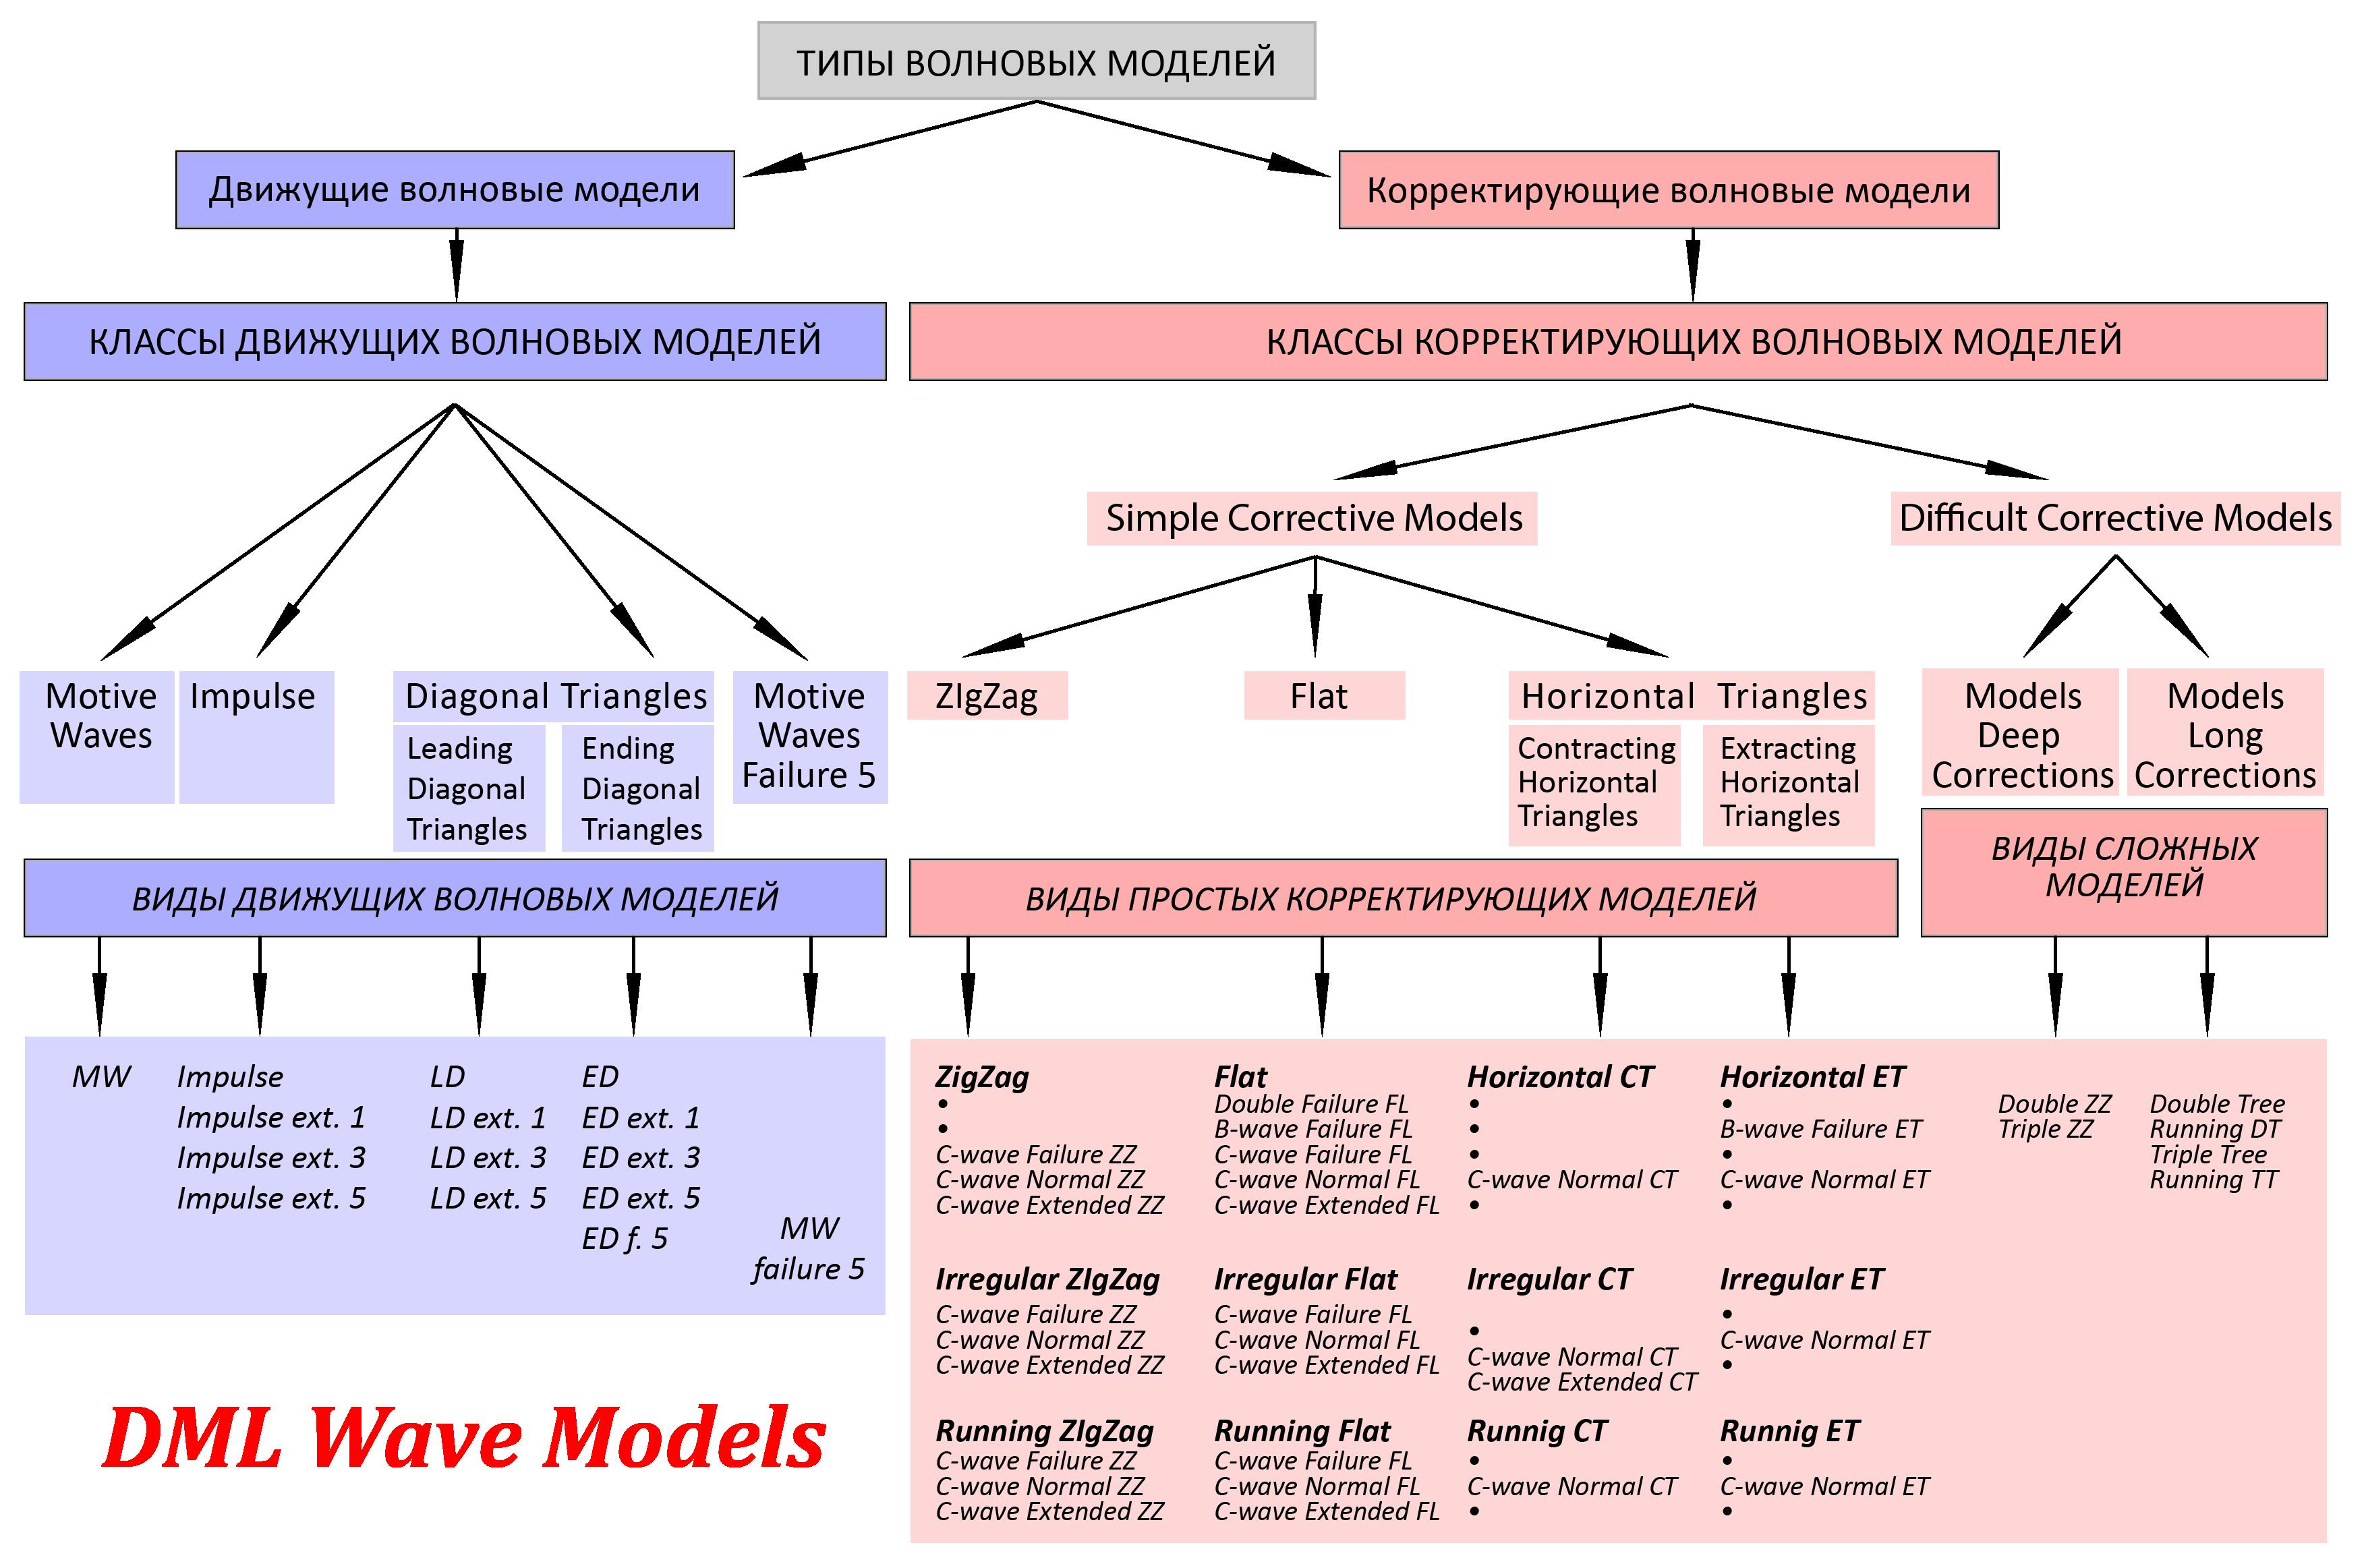 03_02_01 Classification 02